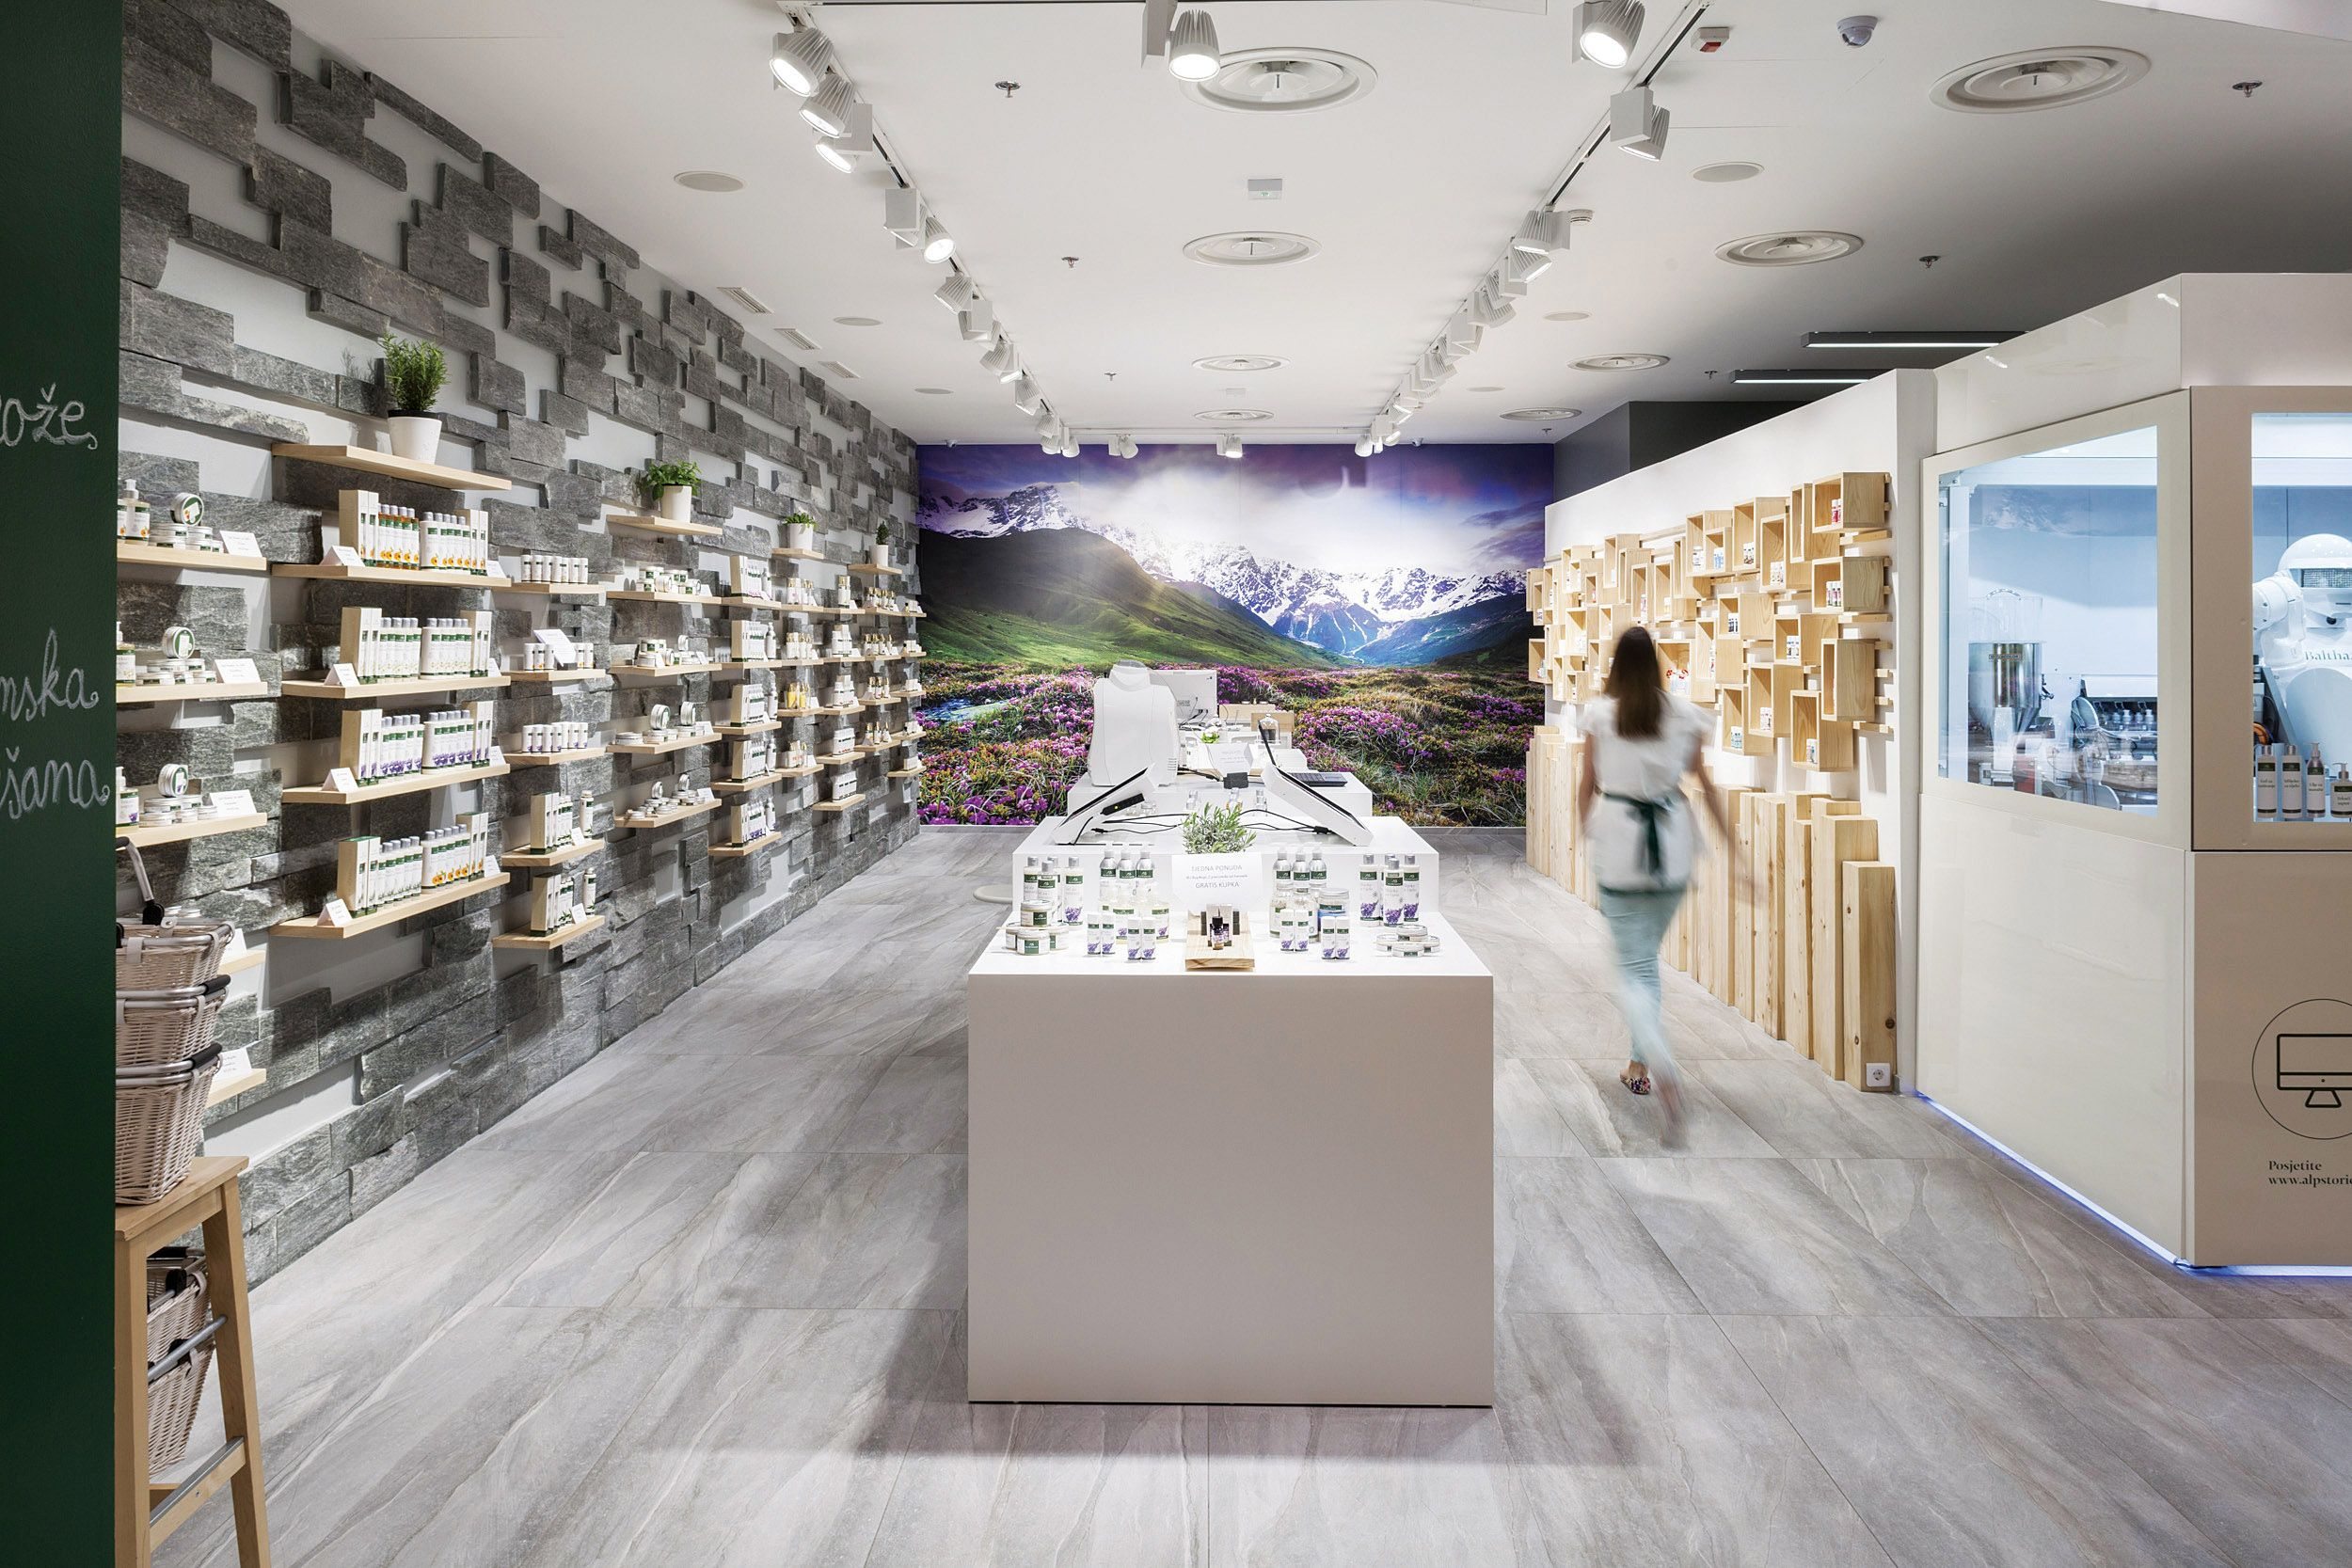 Retail Design Of Cosmetic Store Alpstories Retail Design Retail Design Blog Design